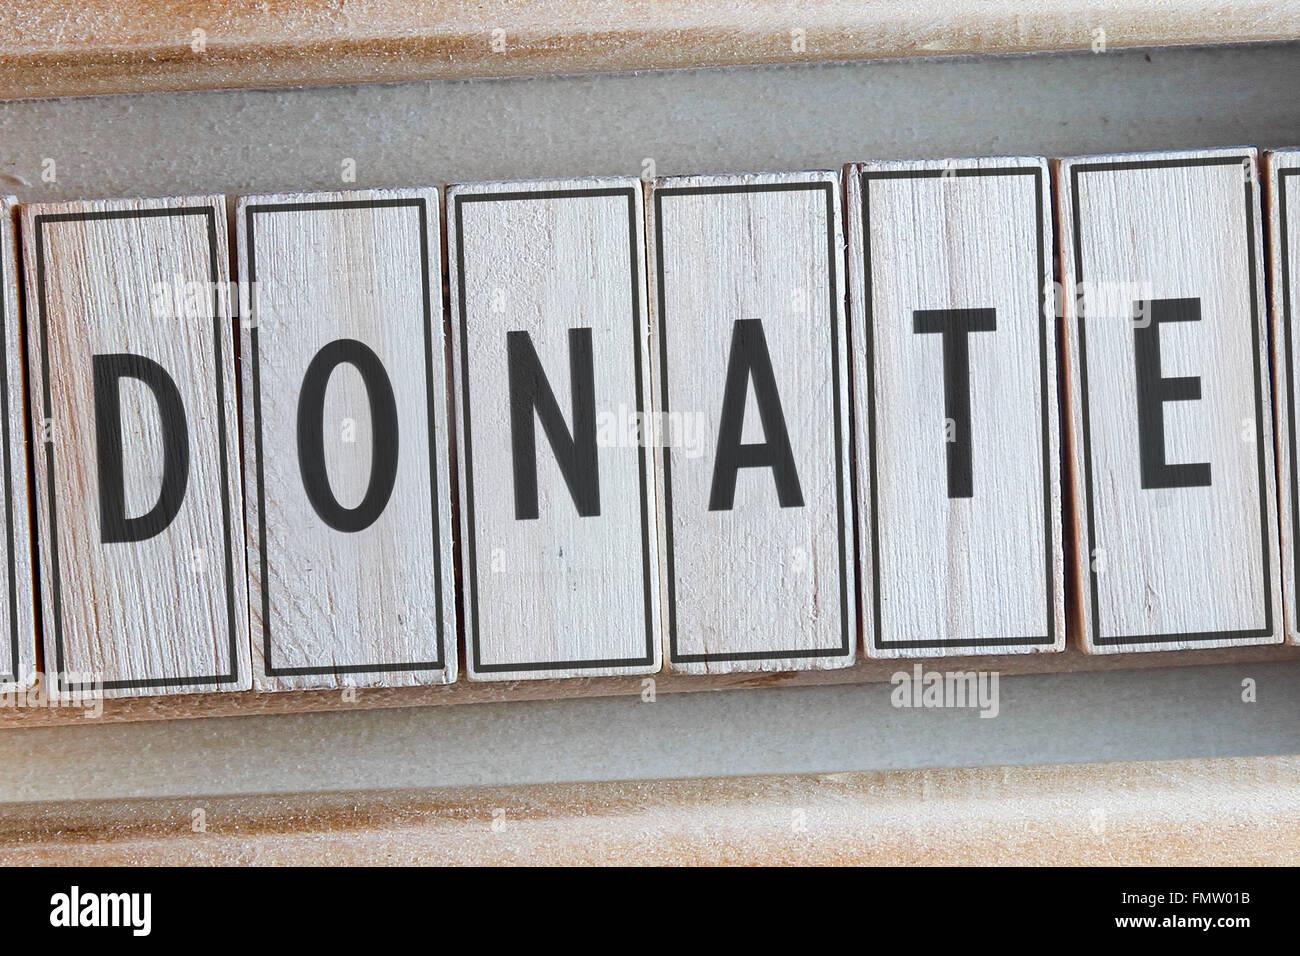 Donate word written on wood - Stock Image